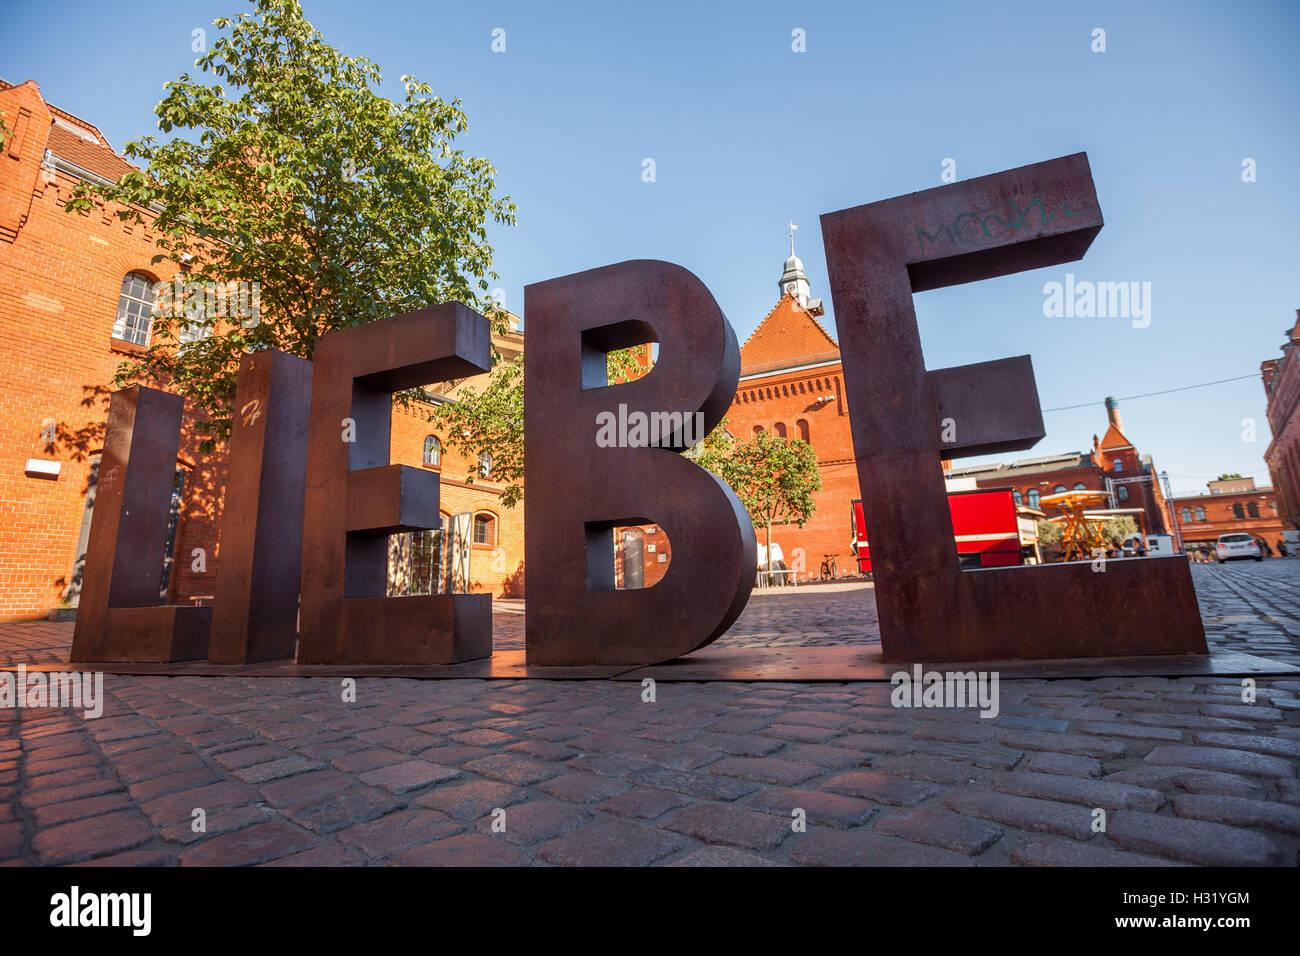 BERLIN - June 6: LIEBE ('Love') sign at the Kulturbrauerei on June 6, 2016 in Berlin. - Stock Image